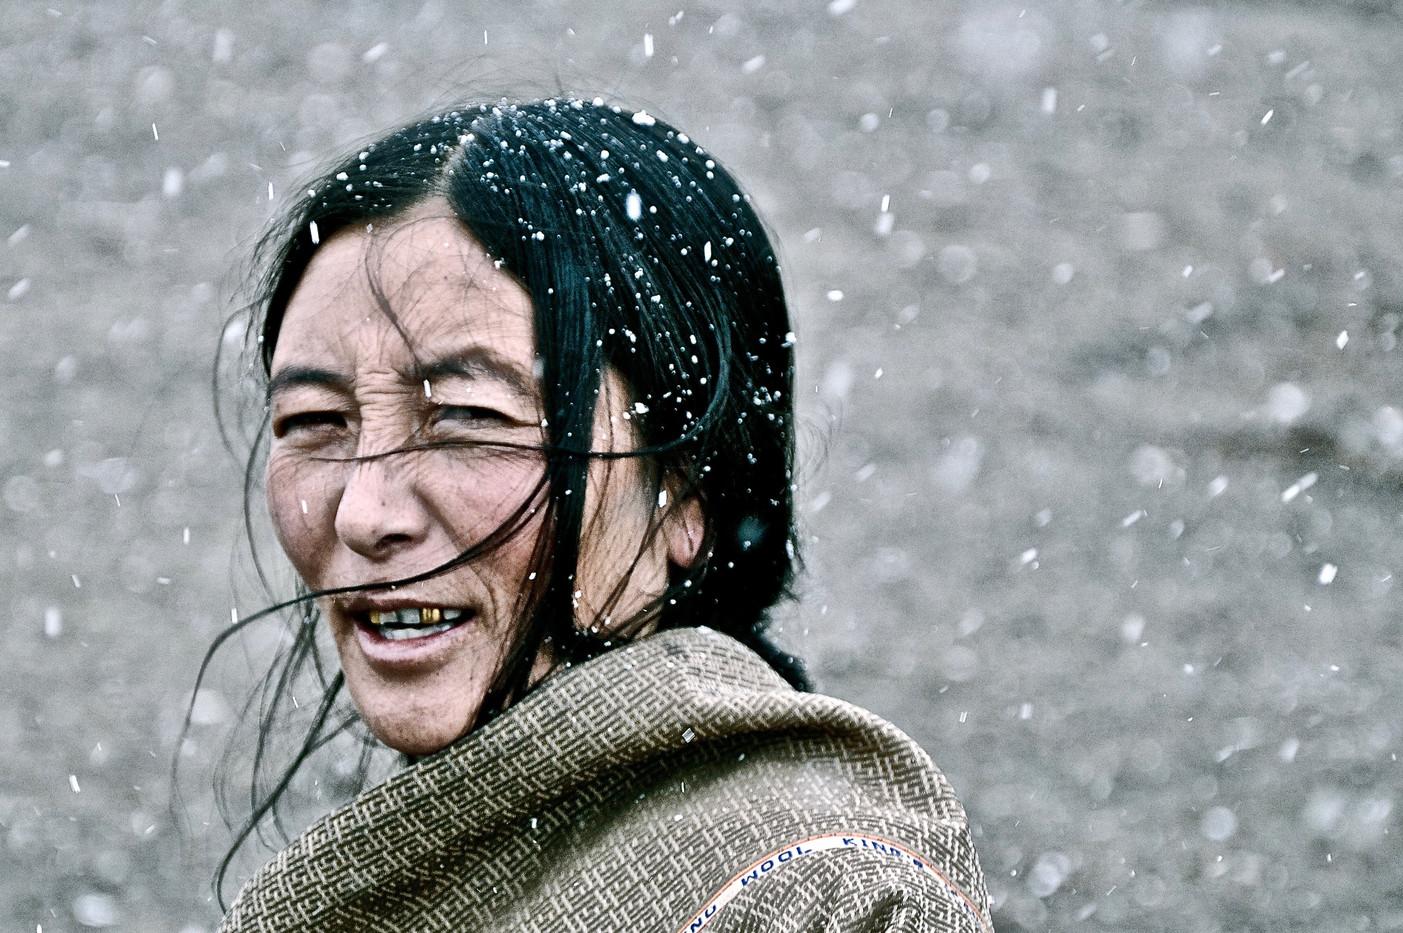 Goddess 1 - Amye Machin, Qinghai/Amdo